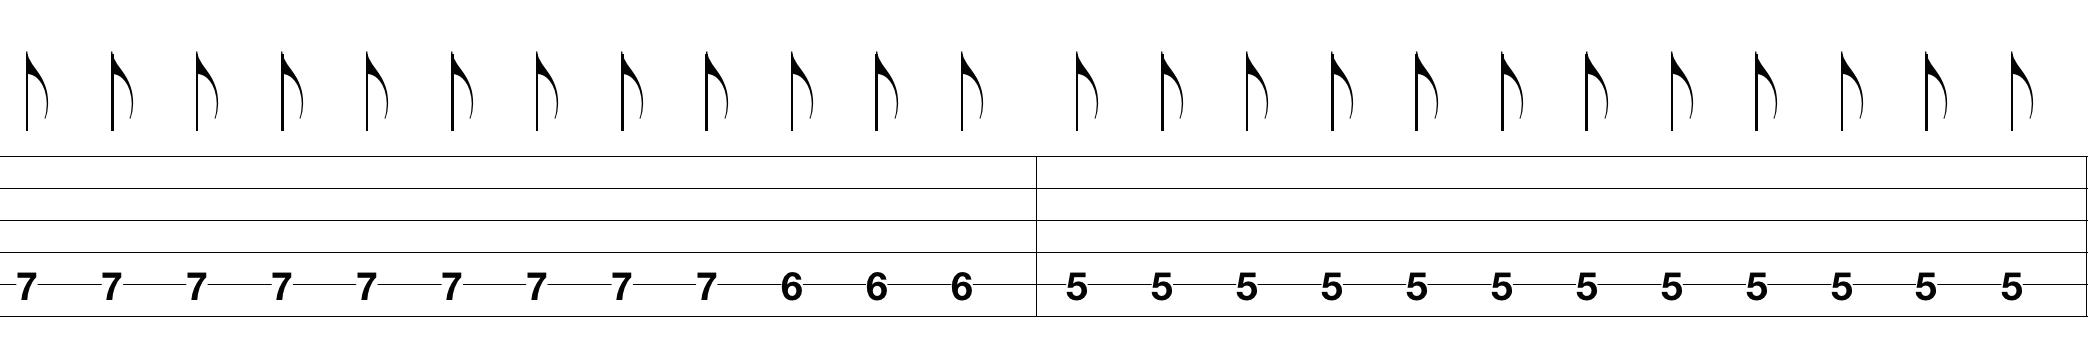 guitar-tabs-blues_4.png